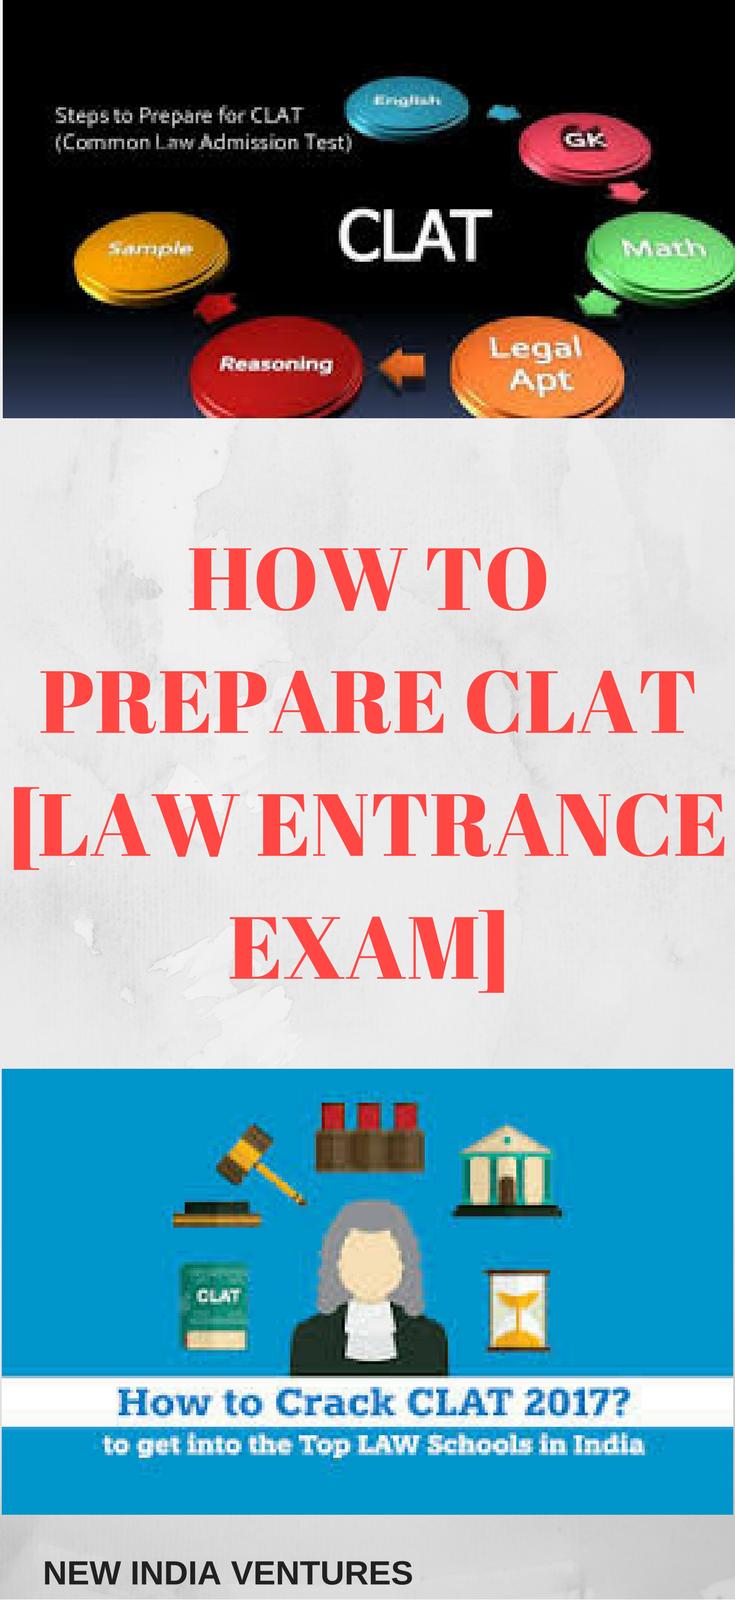 How To Prepare Clat 2017 Law Entrance Exam New India Ventures Entrance Exam Exam India School